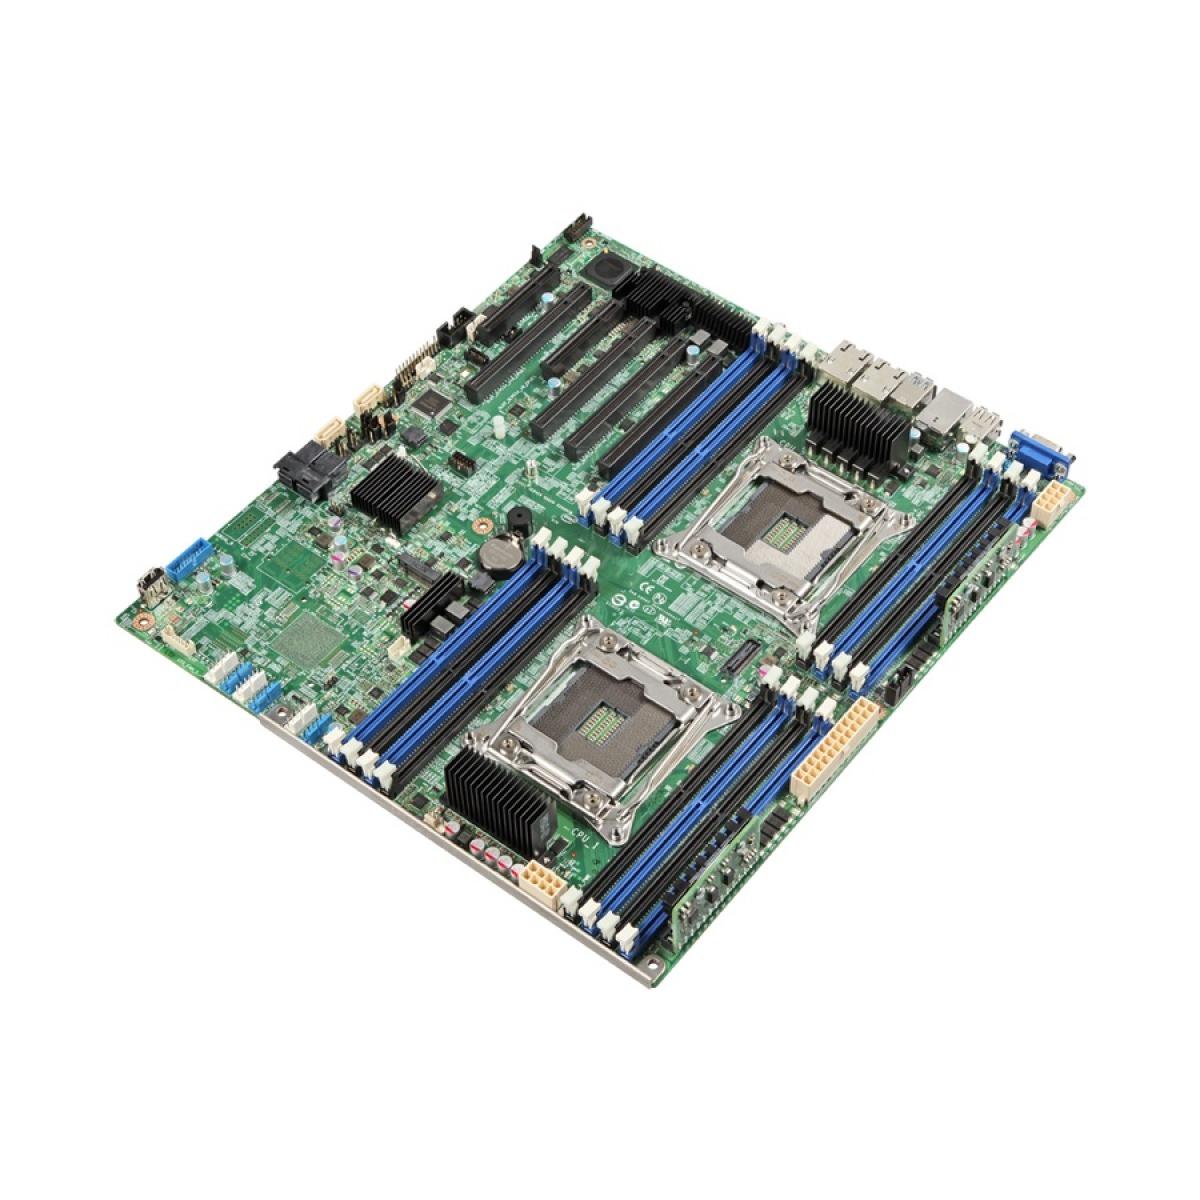 INTEL S2600CW2R Server Motherboard, Dual 2011, C612, 16xDIMM, 2xGbE, PCIe x16, SSI EEB